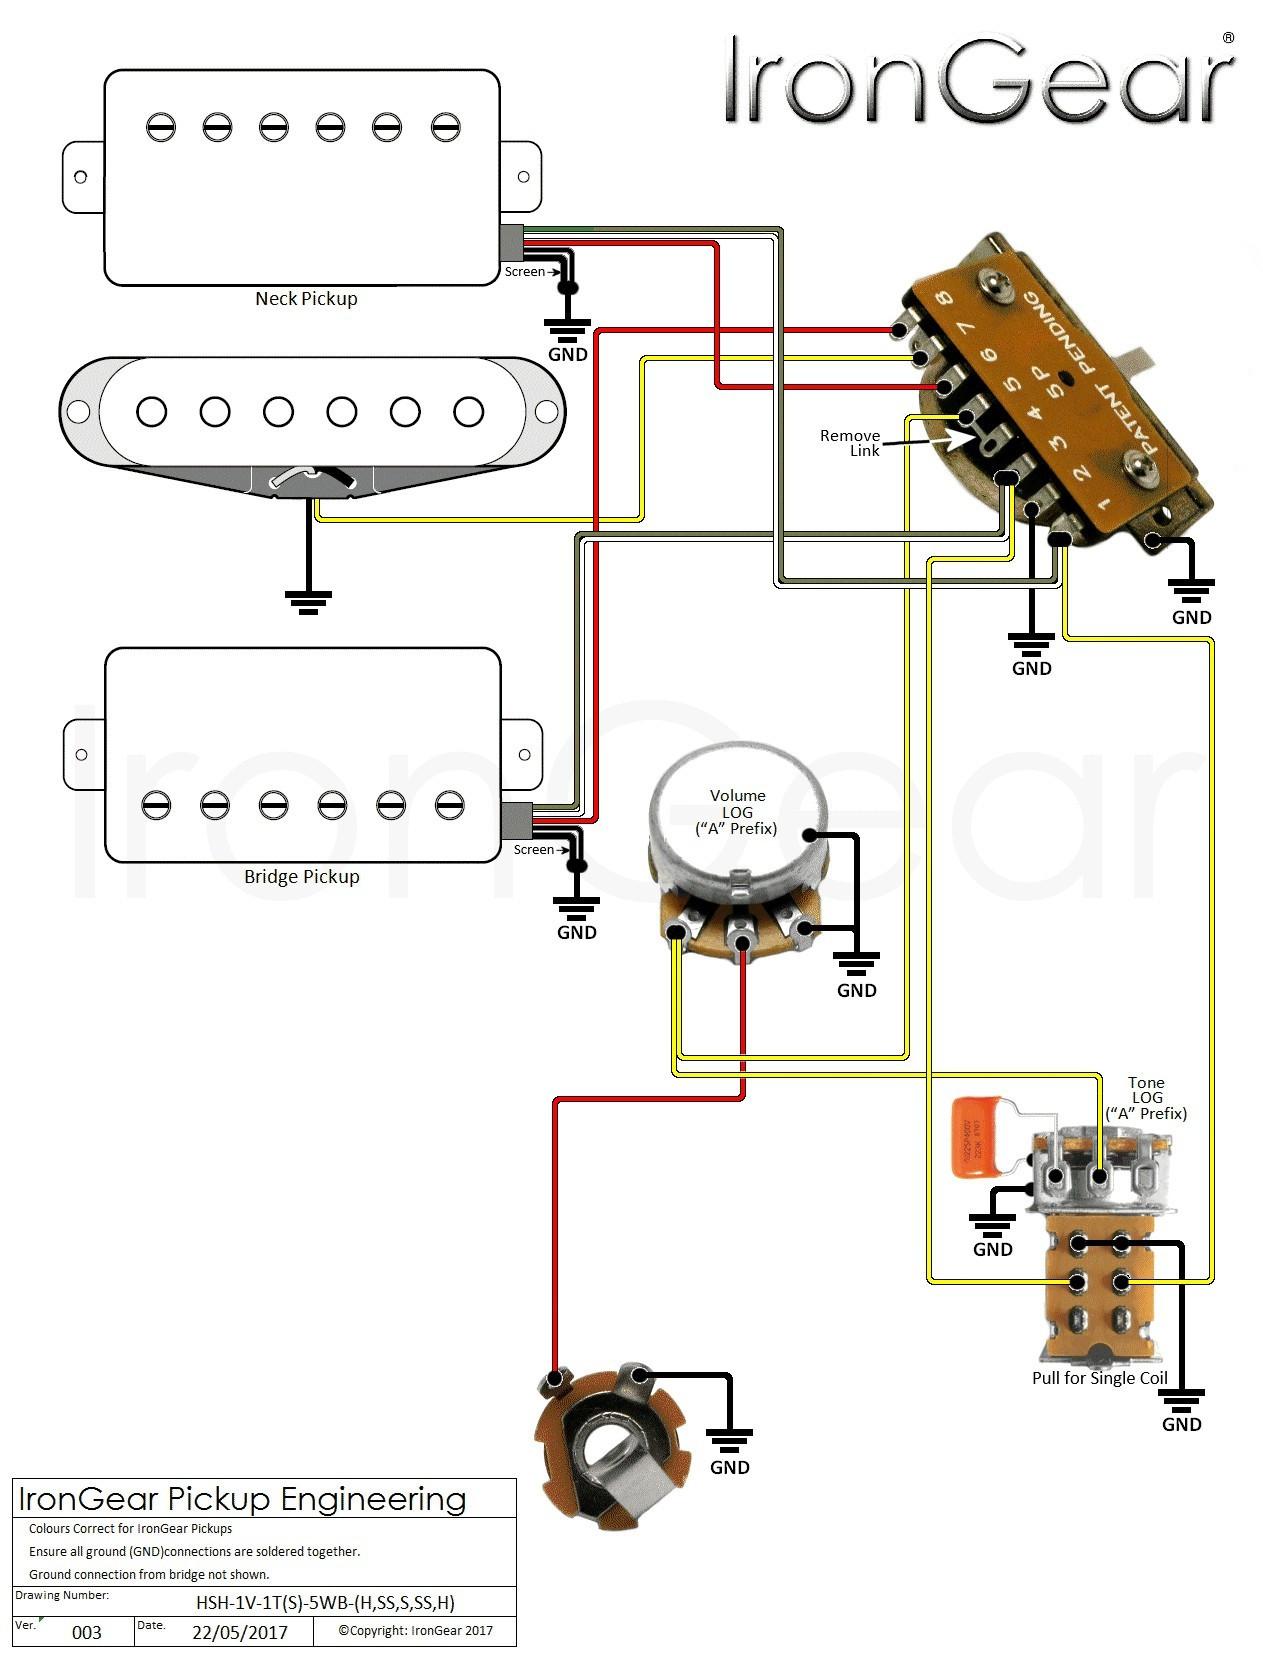 Guitar Volume Wiring Diagram Valid Wiring Diagram 3 Pickup Guitar New Guitar Wiring Diagram 2 Humbucker